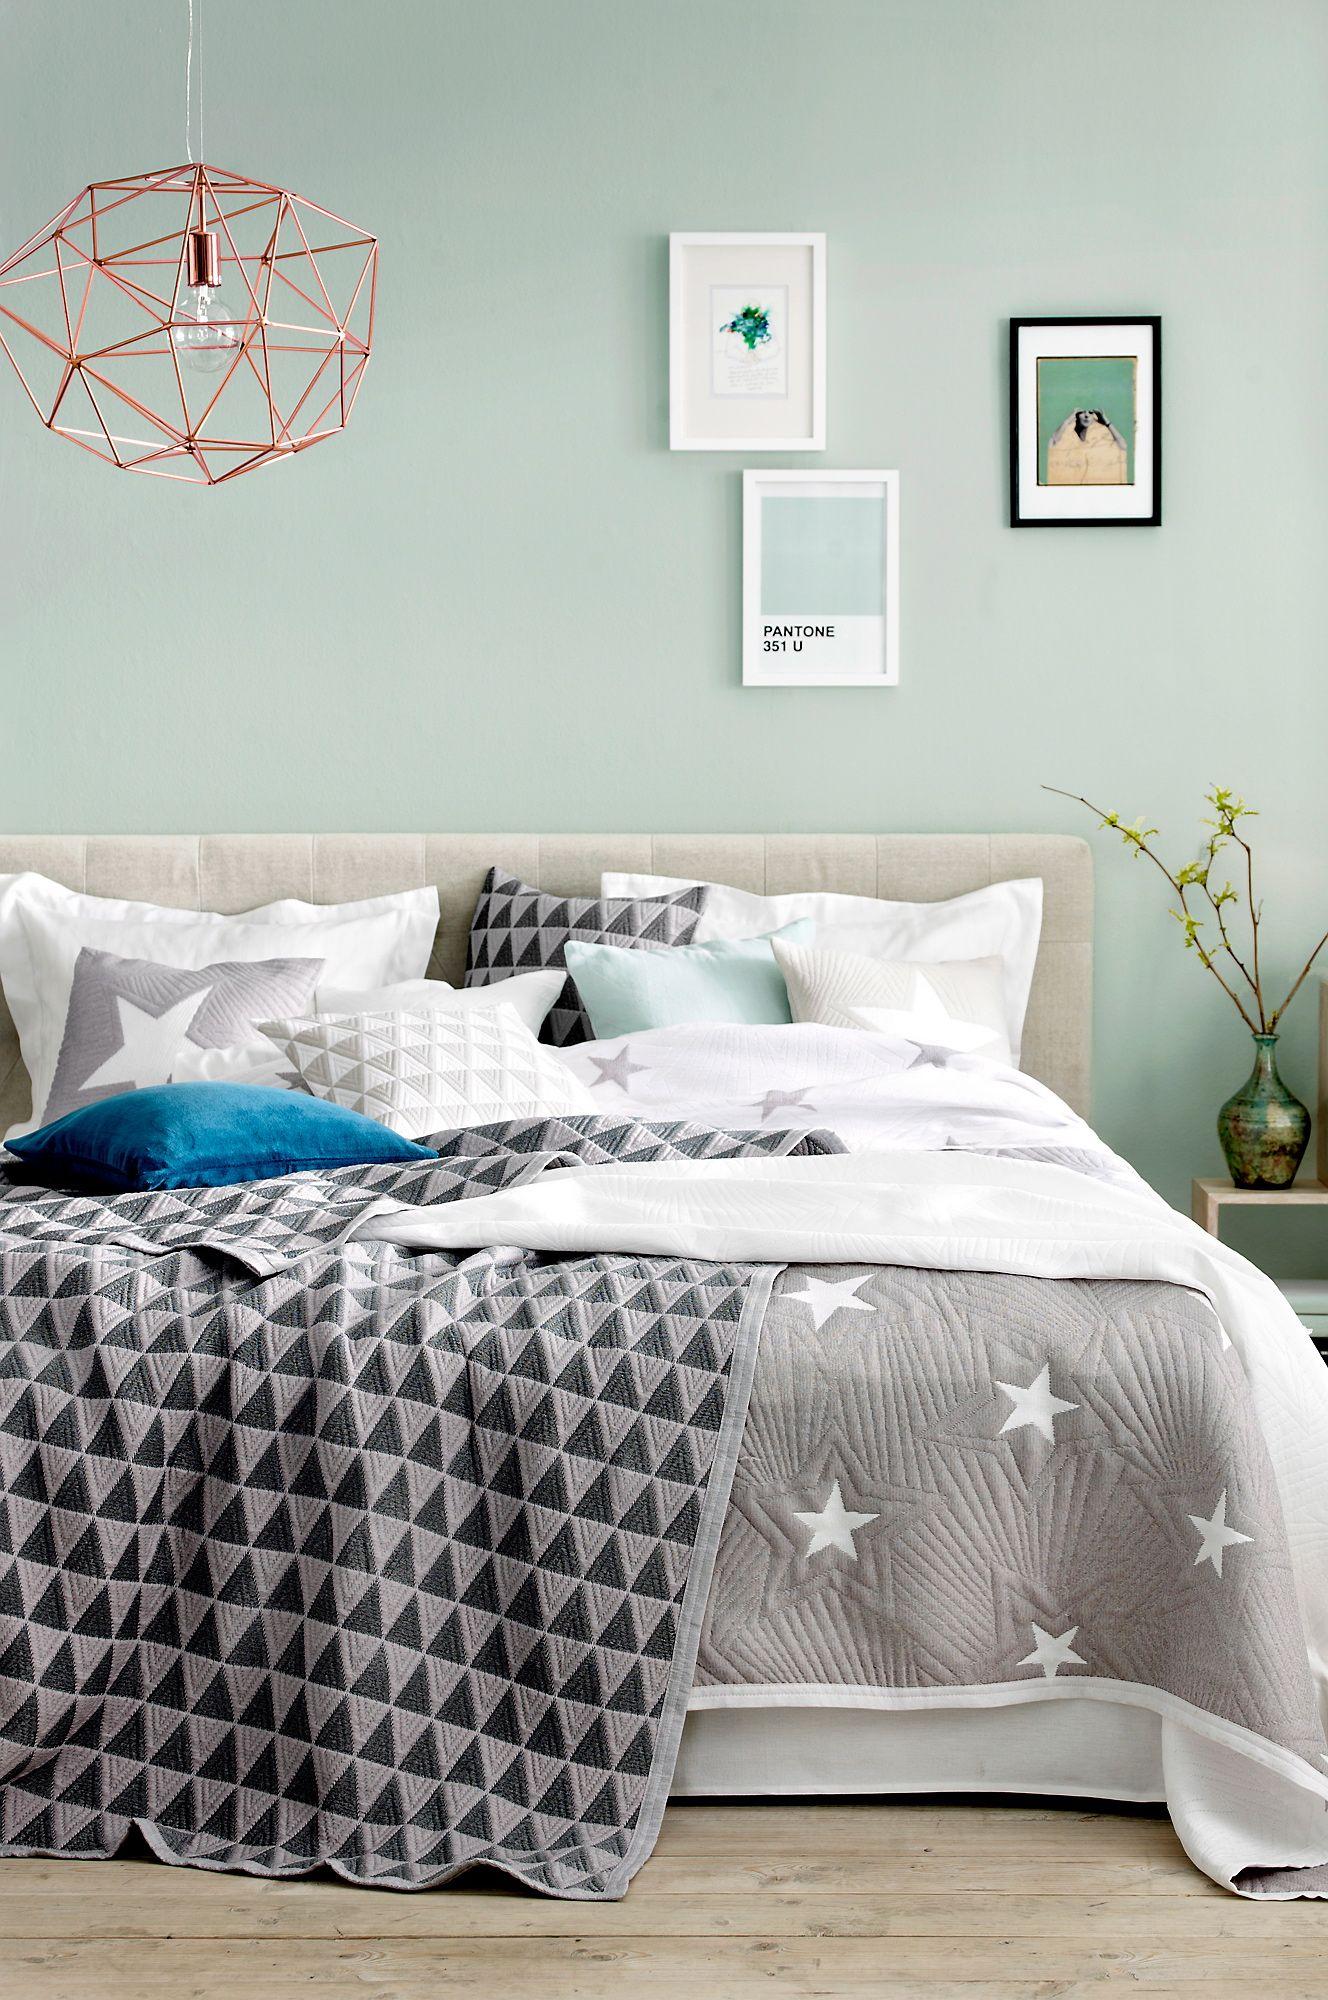 Ellos Home Overkast 260x260 Cm Green Bedroom Walls Mint Green Bedroom Home Decor Bedroom